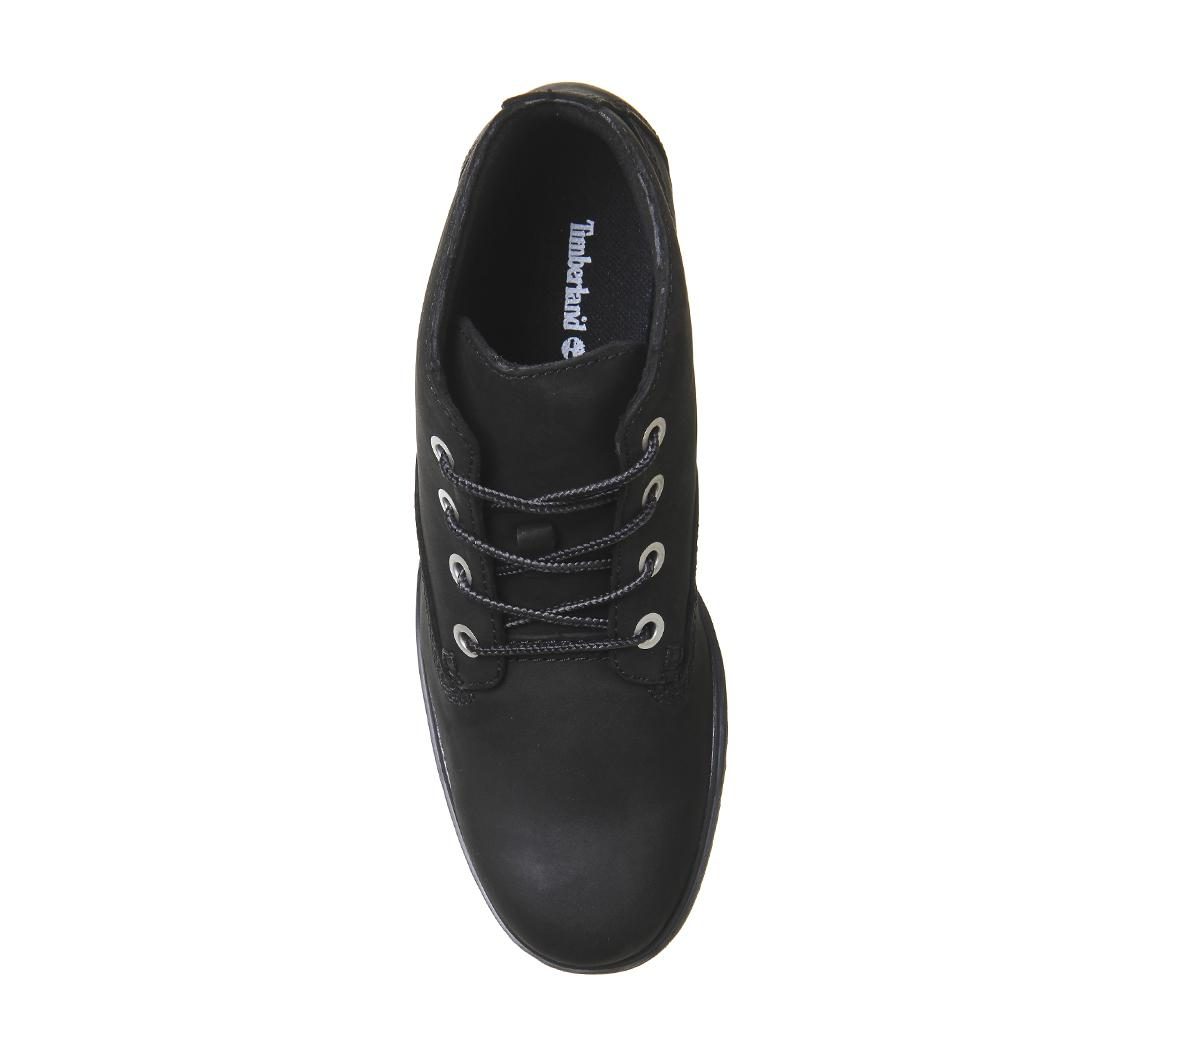 Slim Nellie Chukka Boots in Black